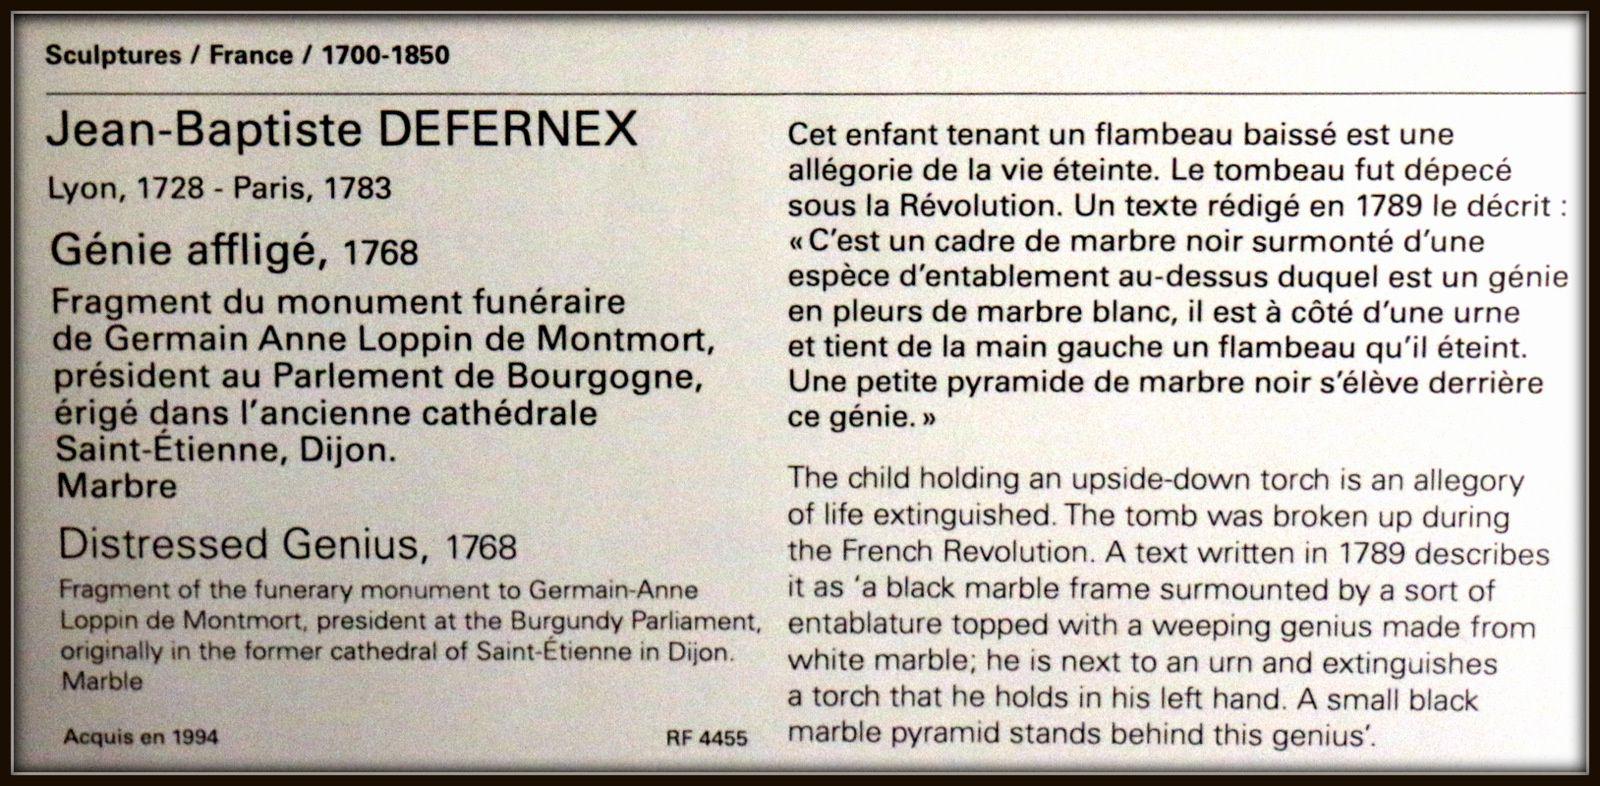 Jean-Baptiste Defernex, Génie affligé